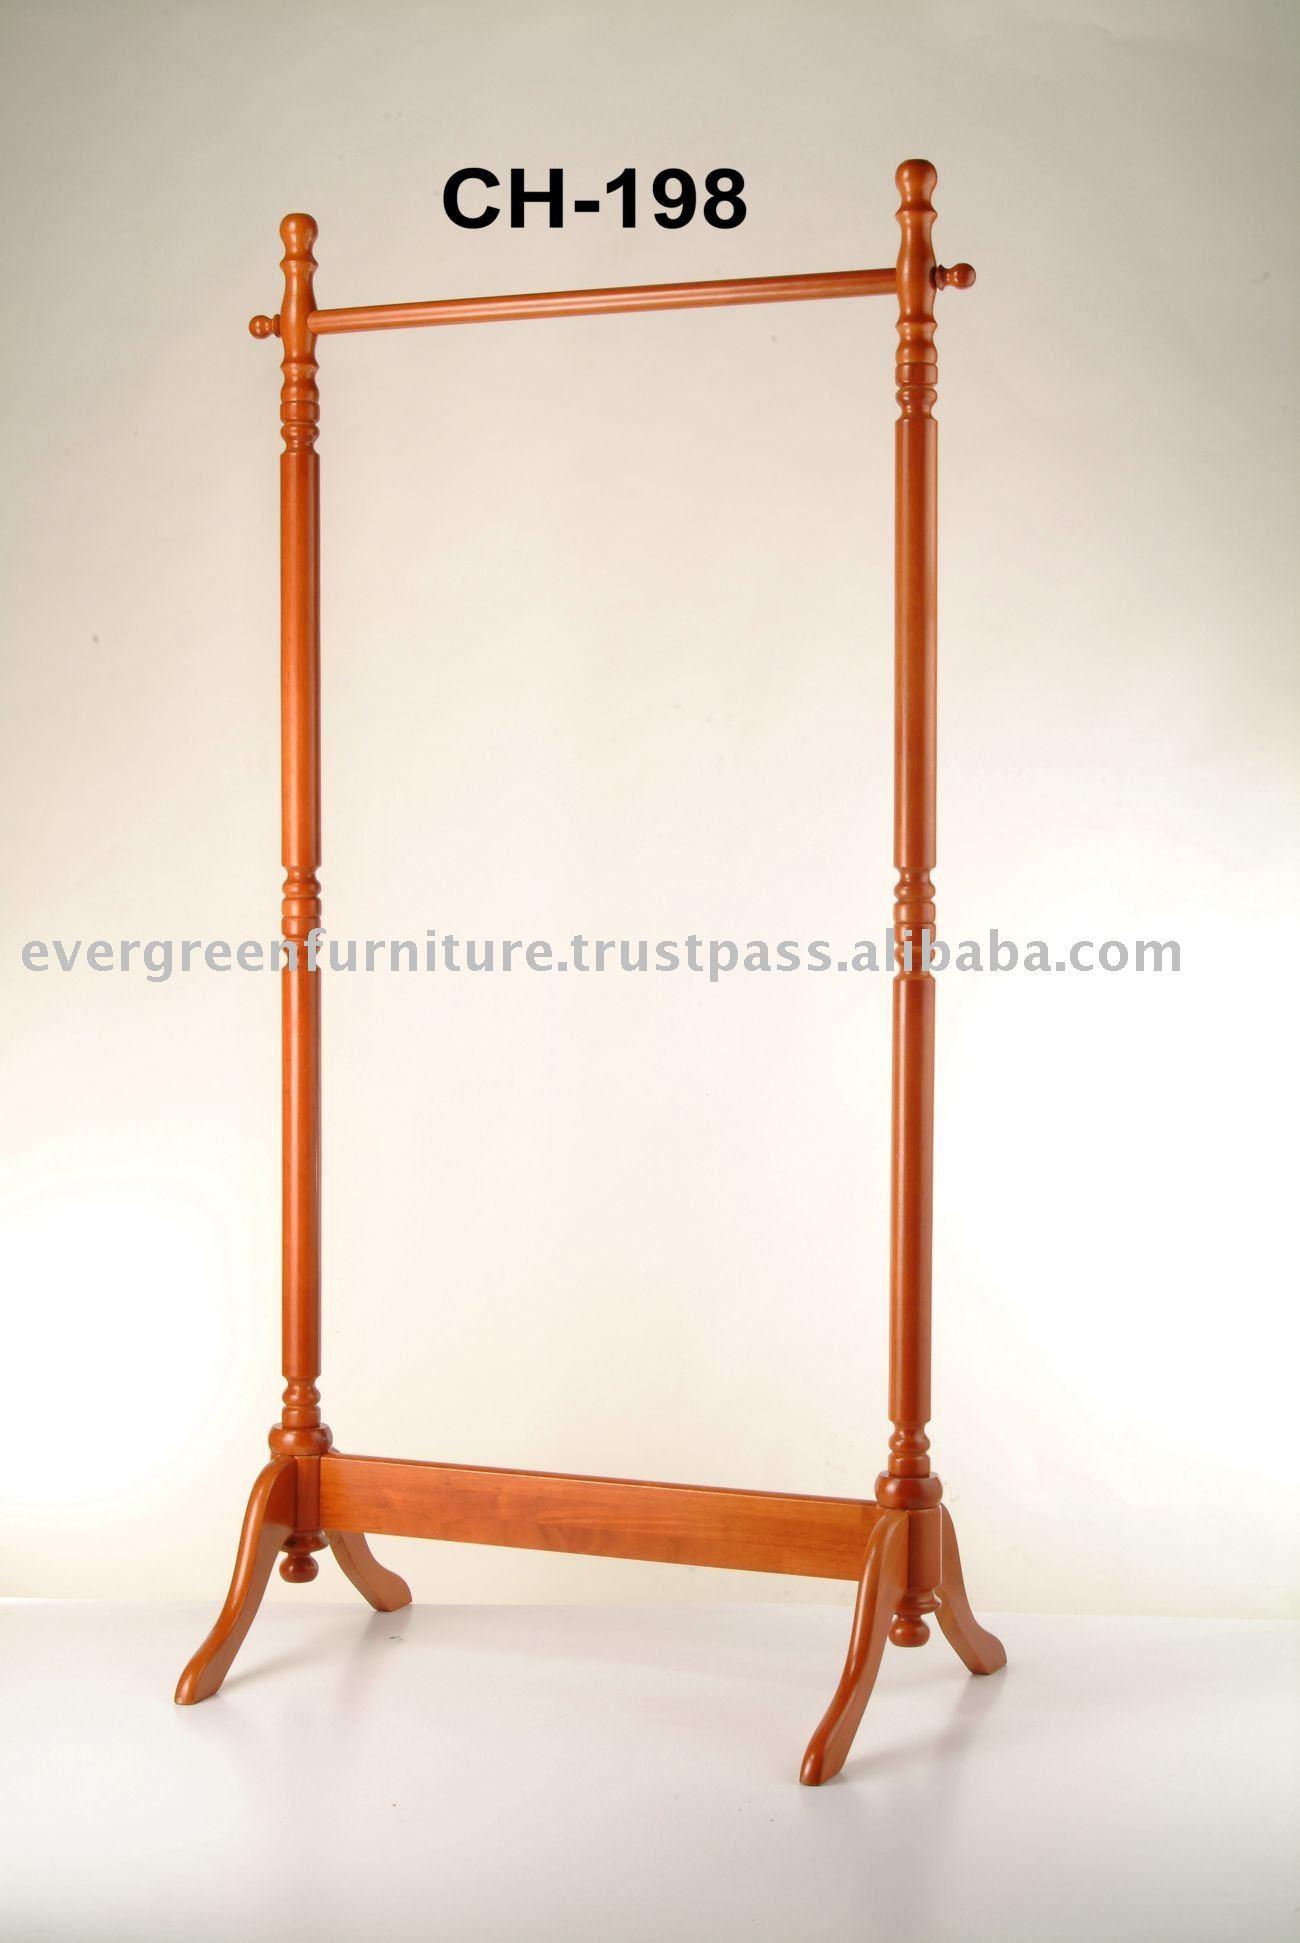 Wooden garment rack buy garment display rackwooden clothes rackclothes display rack product on alibaba com